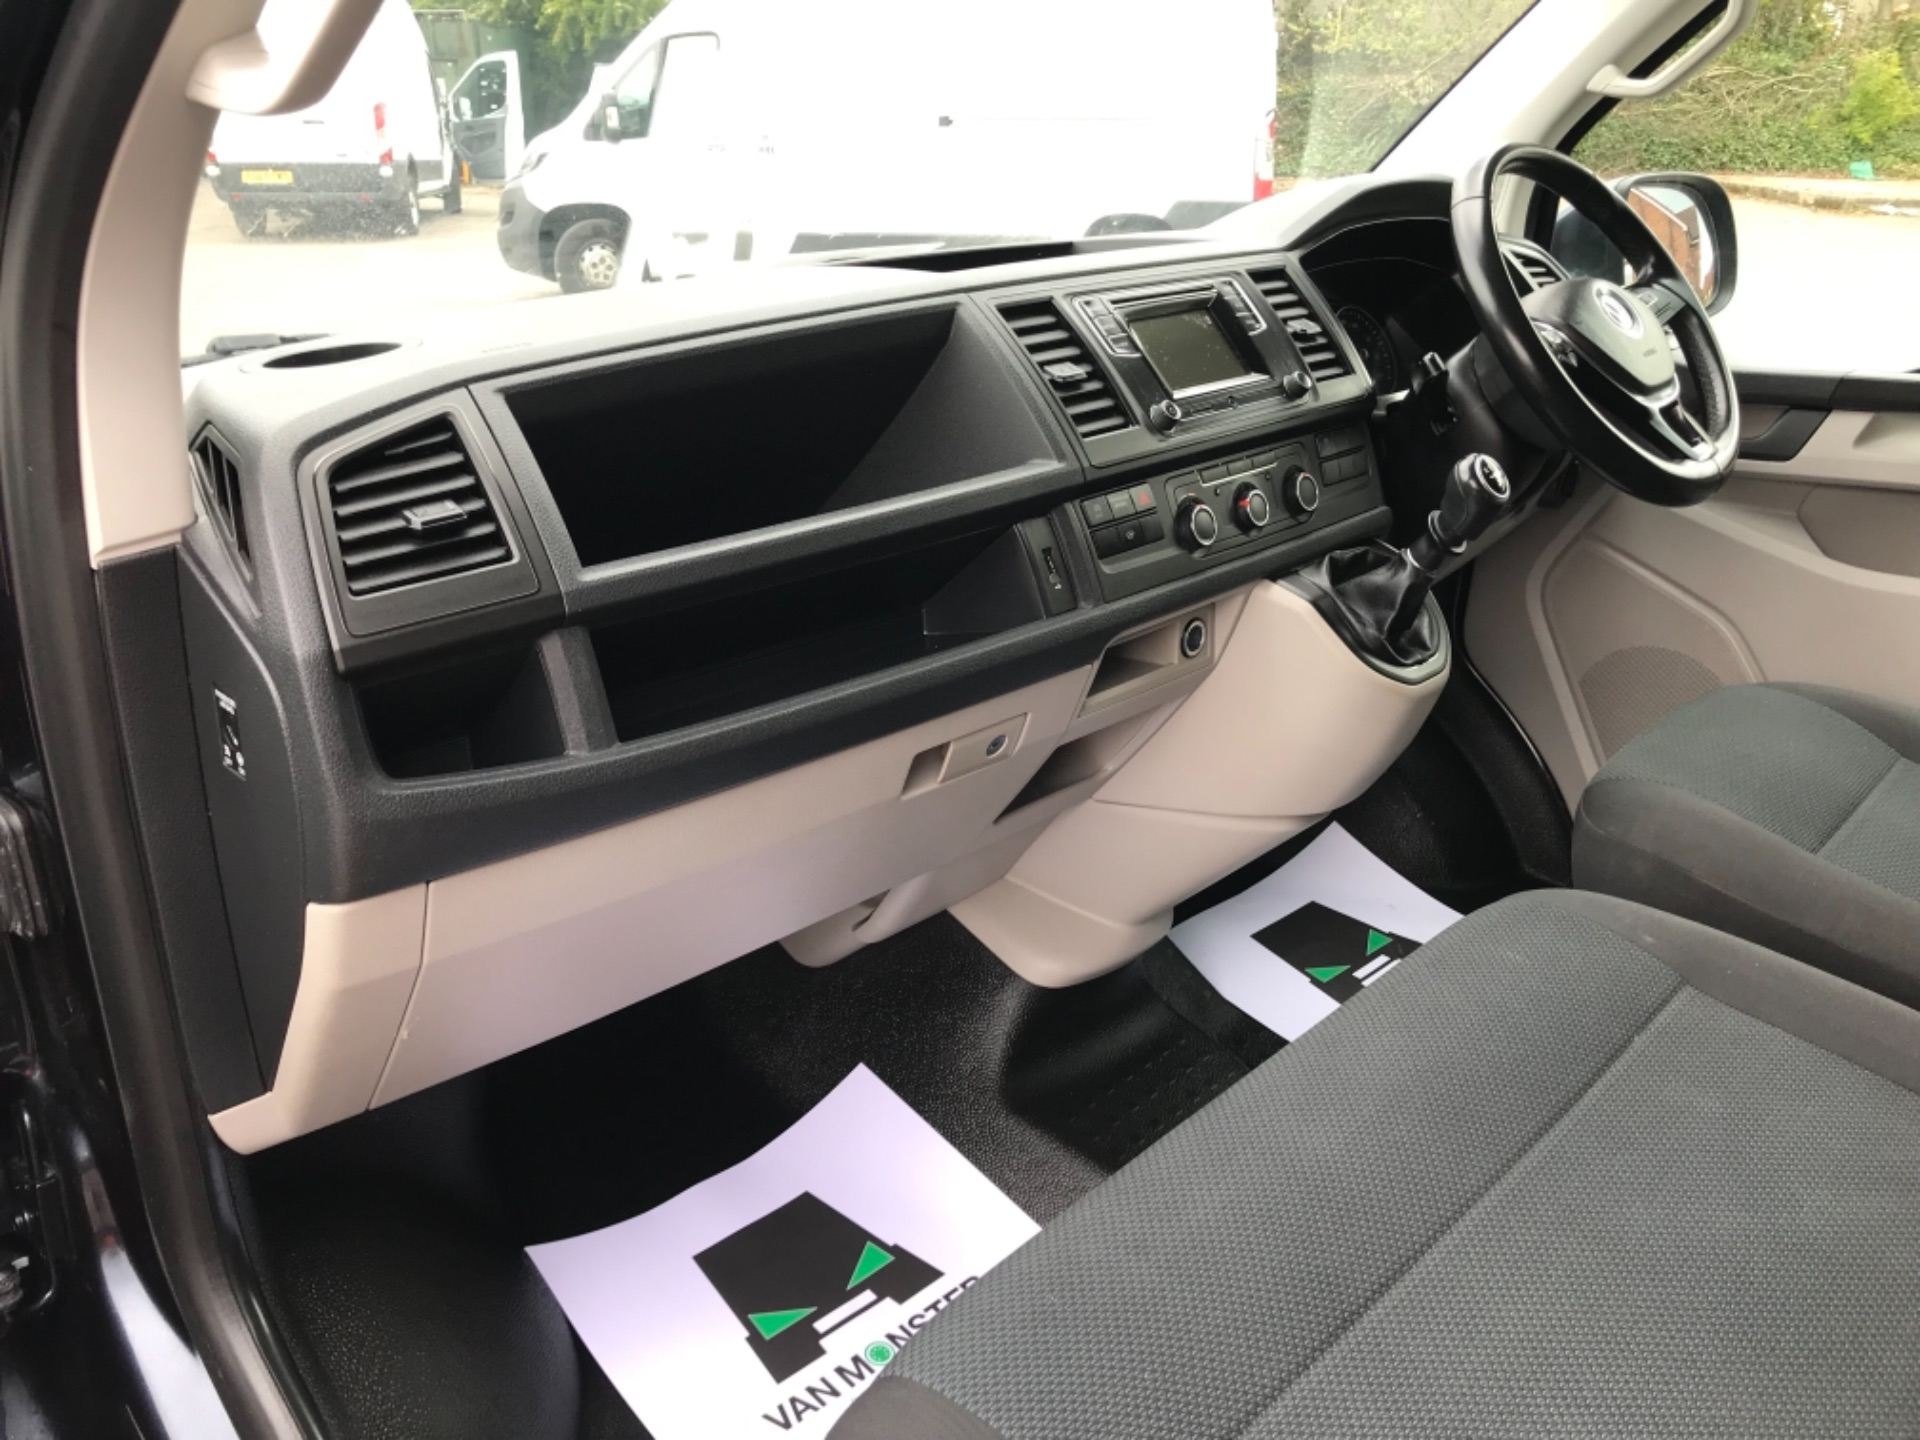 2019 Volkswagen Transporter 2.0 Tdi Bmt 150 Highline Van EURO 6 (GX69ZSN) Image 26